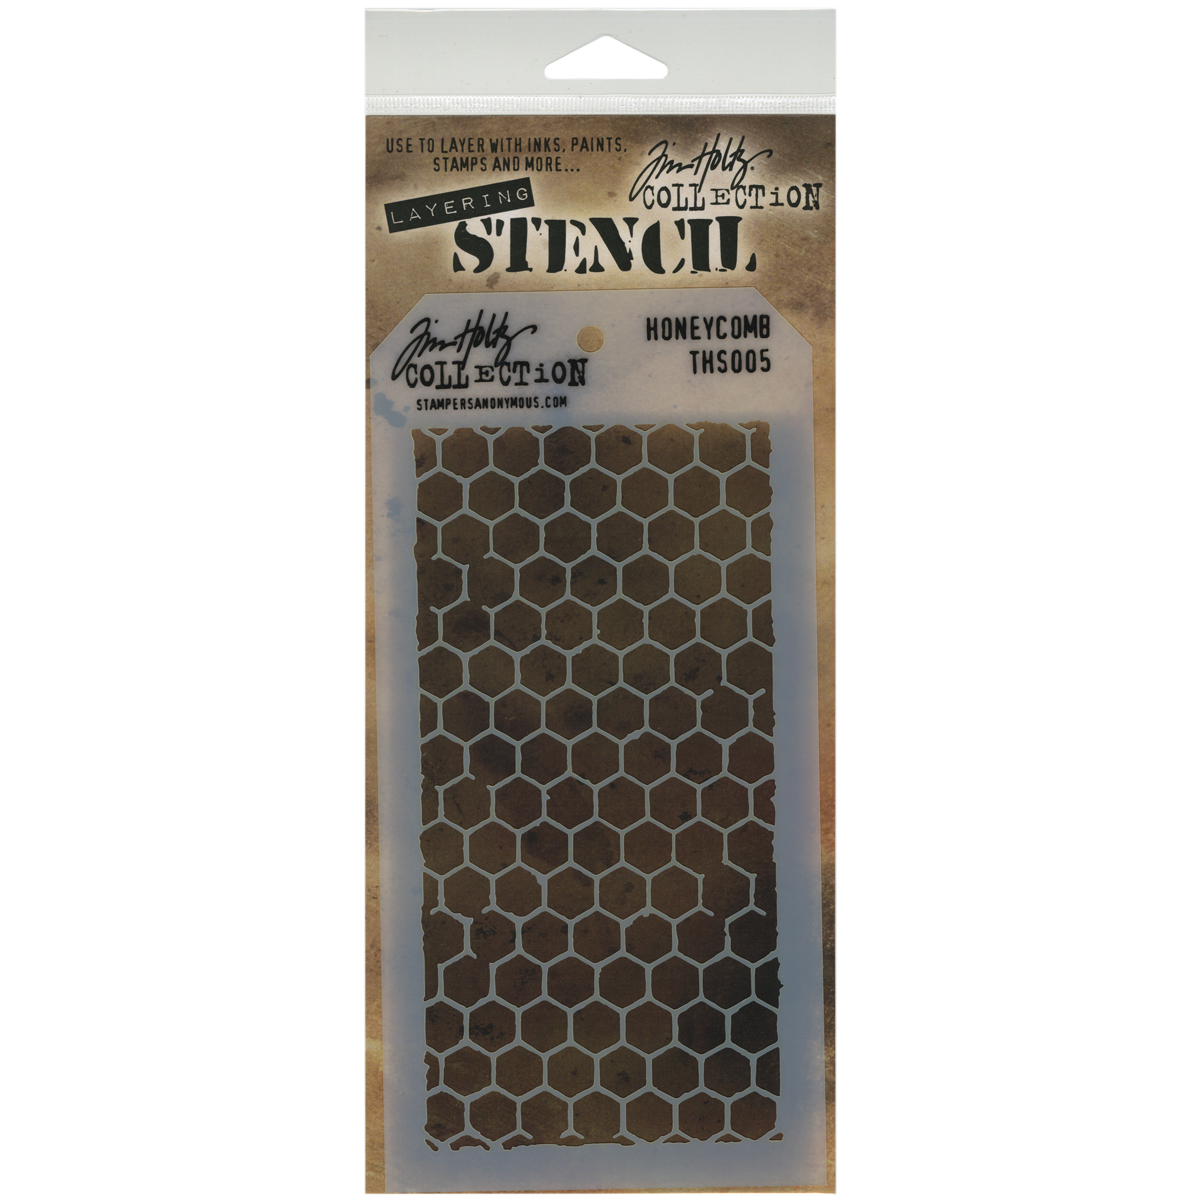 Tim Holtz Layered Stencil 4.125X8.5-Honeycomb